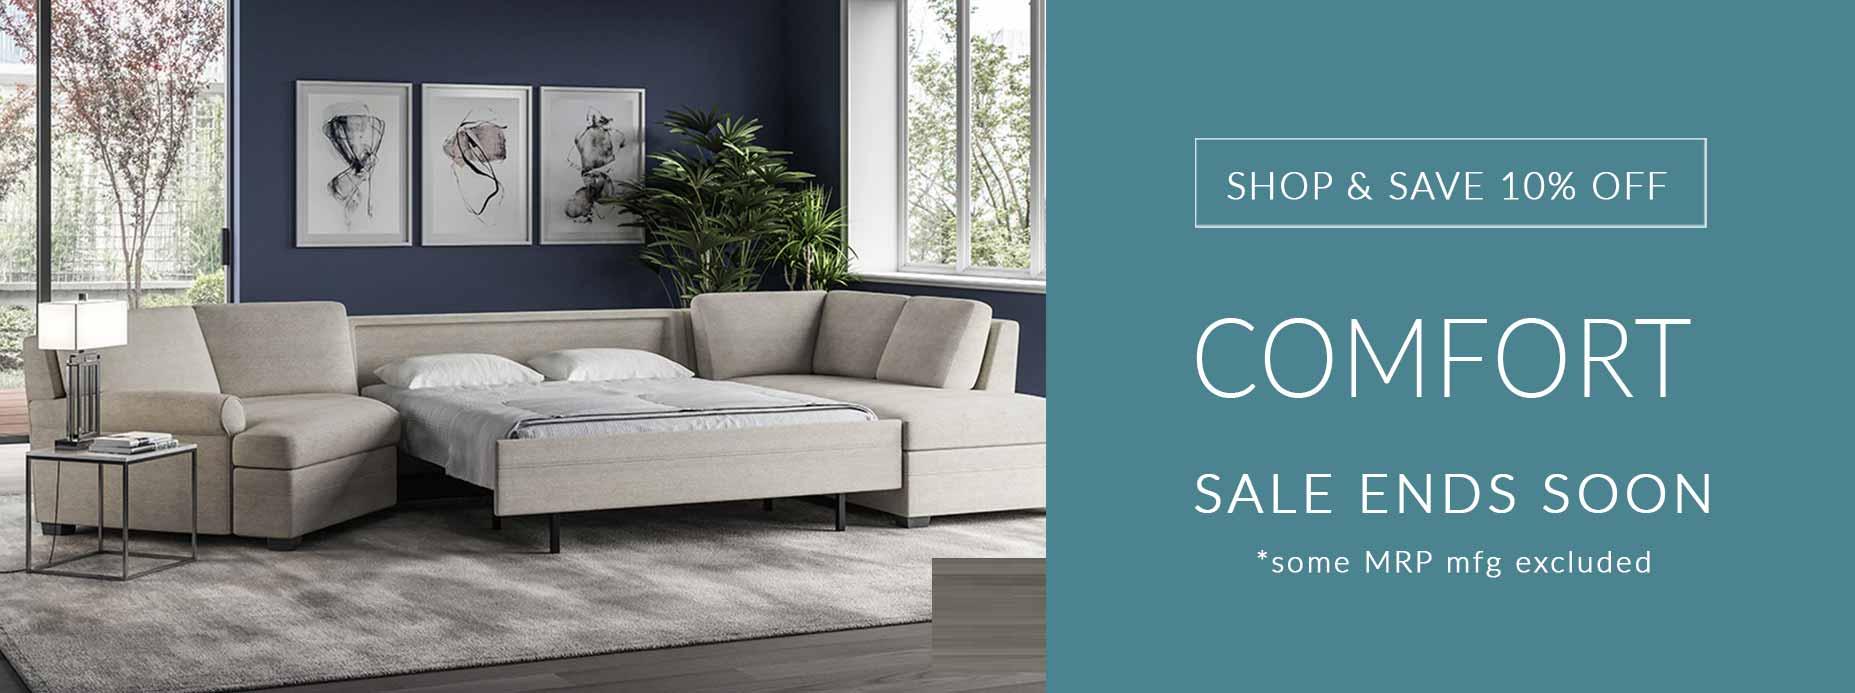 American Leather Comfort Sleeper Sofa